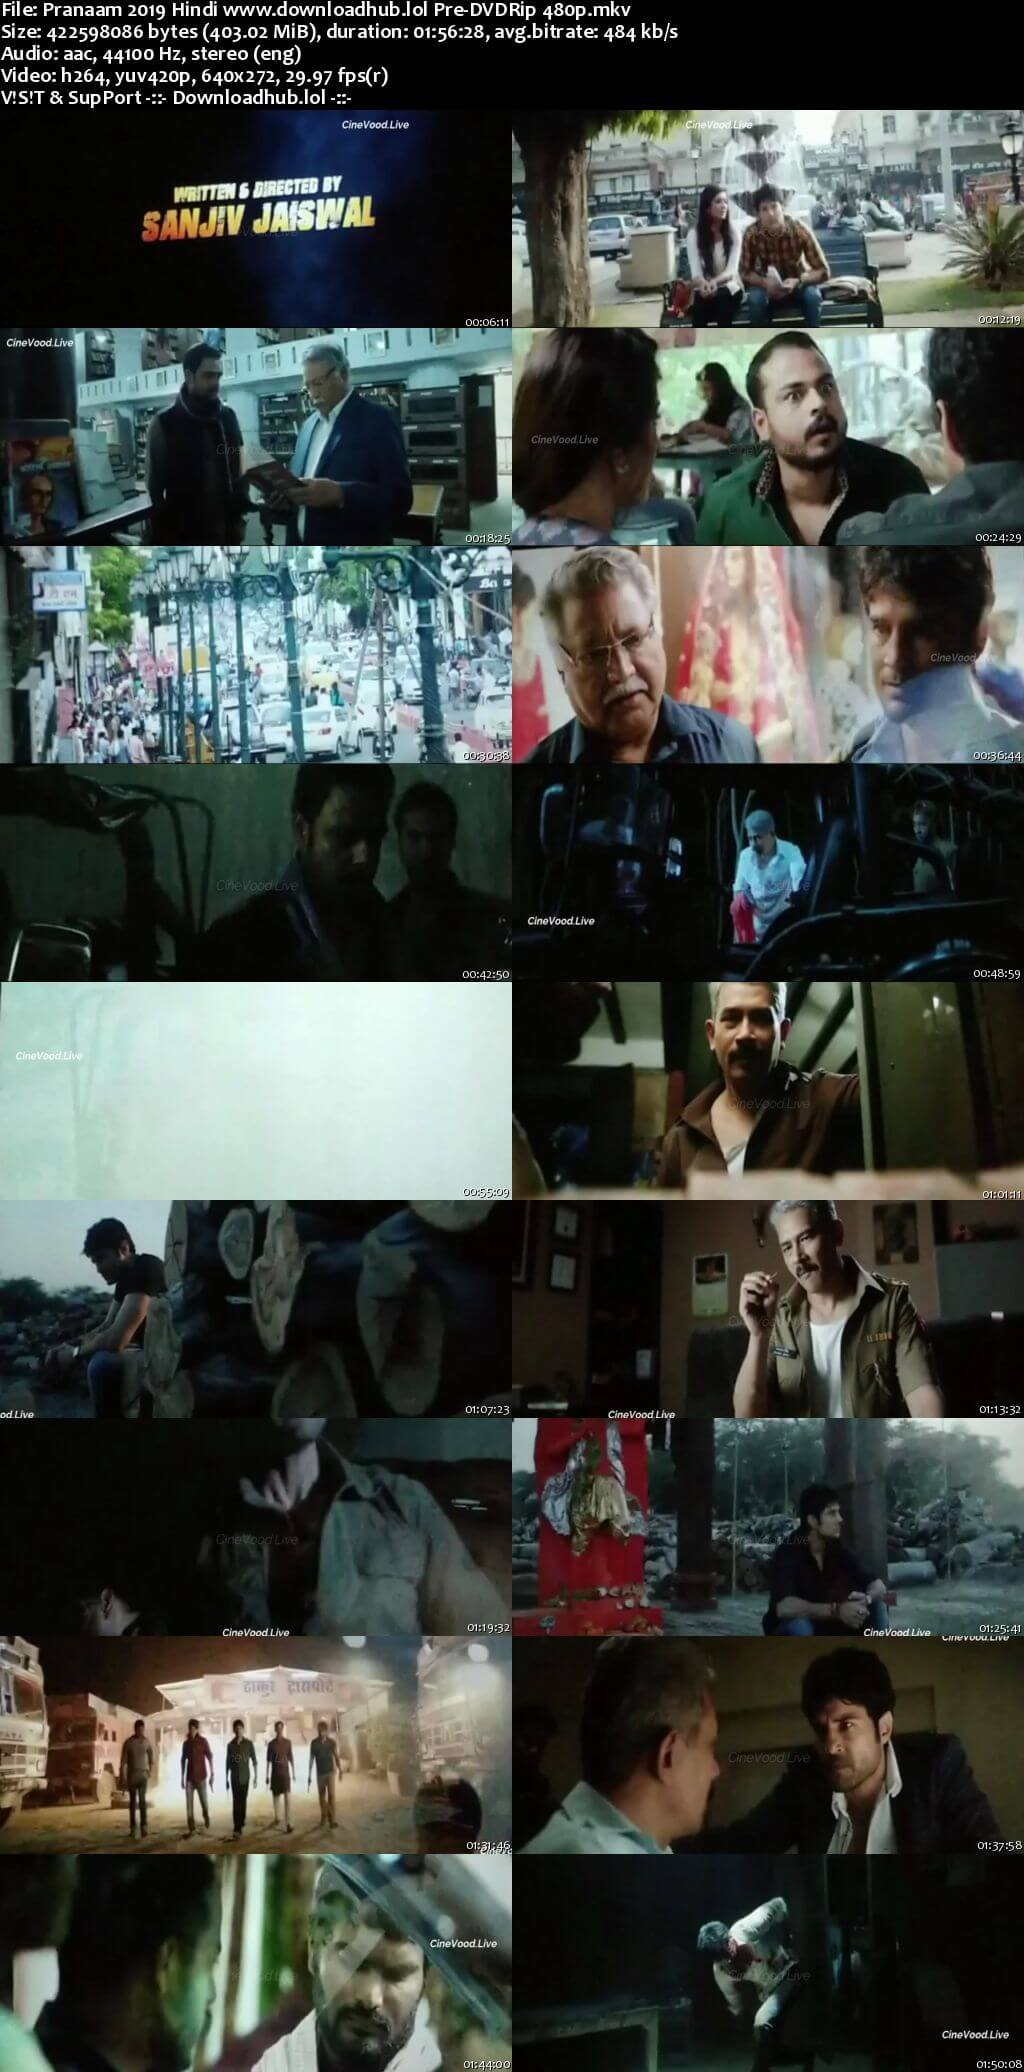 Pranaam 2019 Hindi 400MB Pre-DVDRip 480p